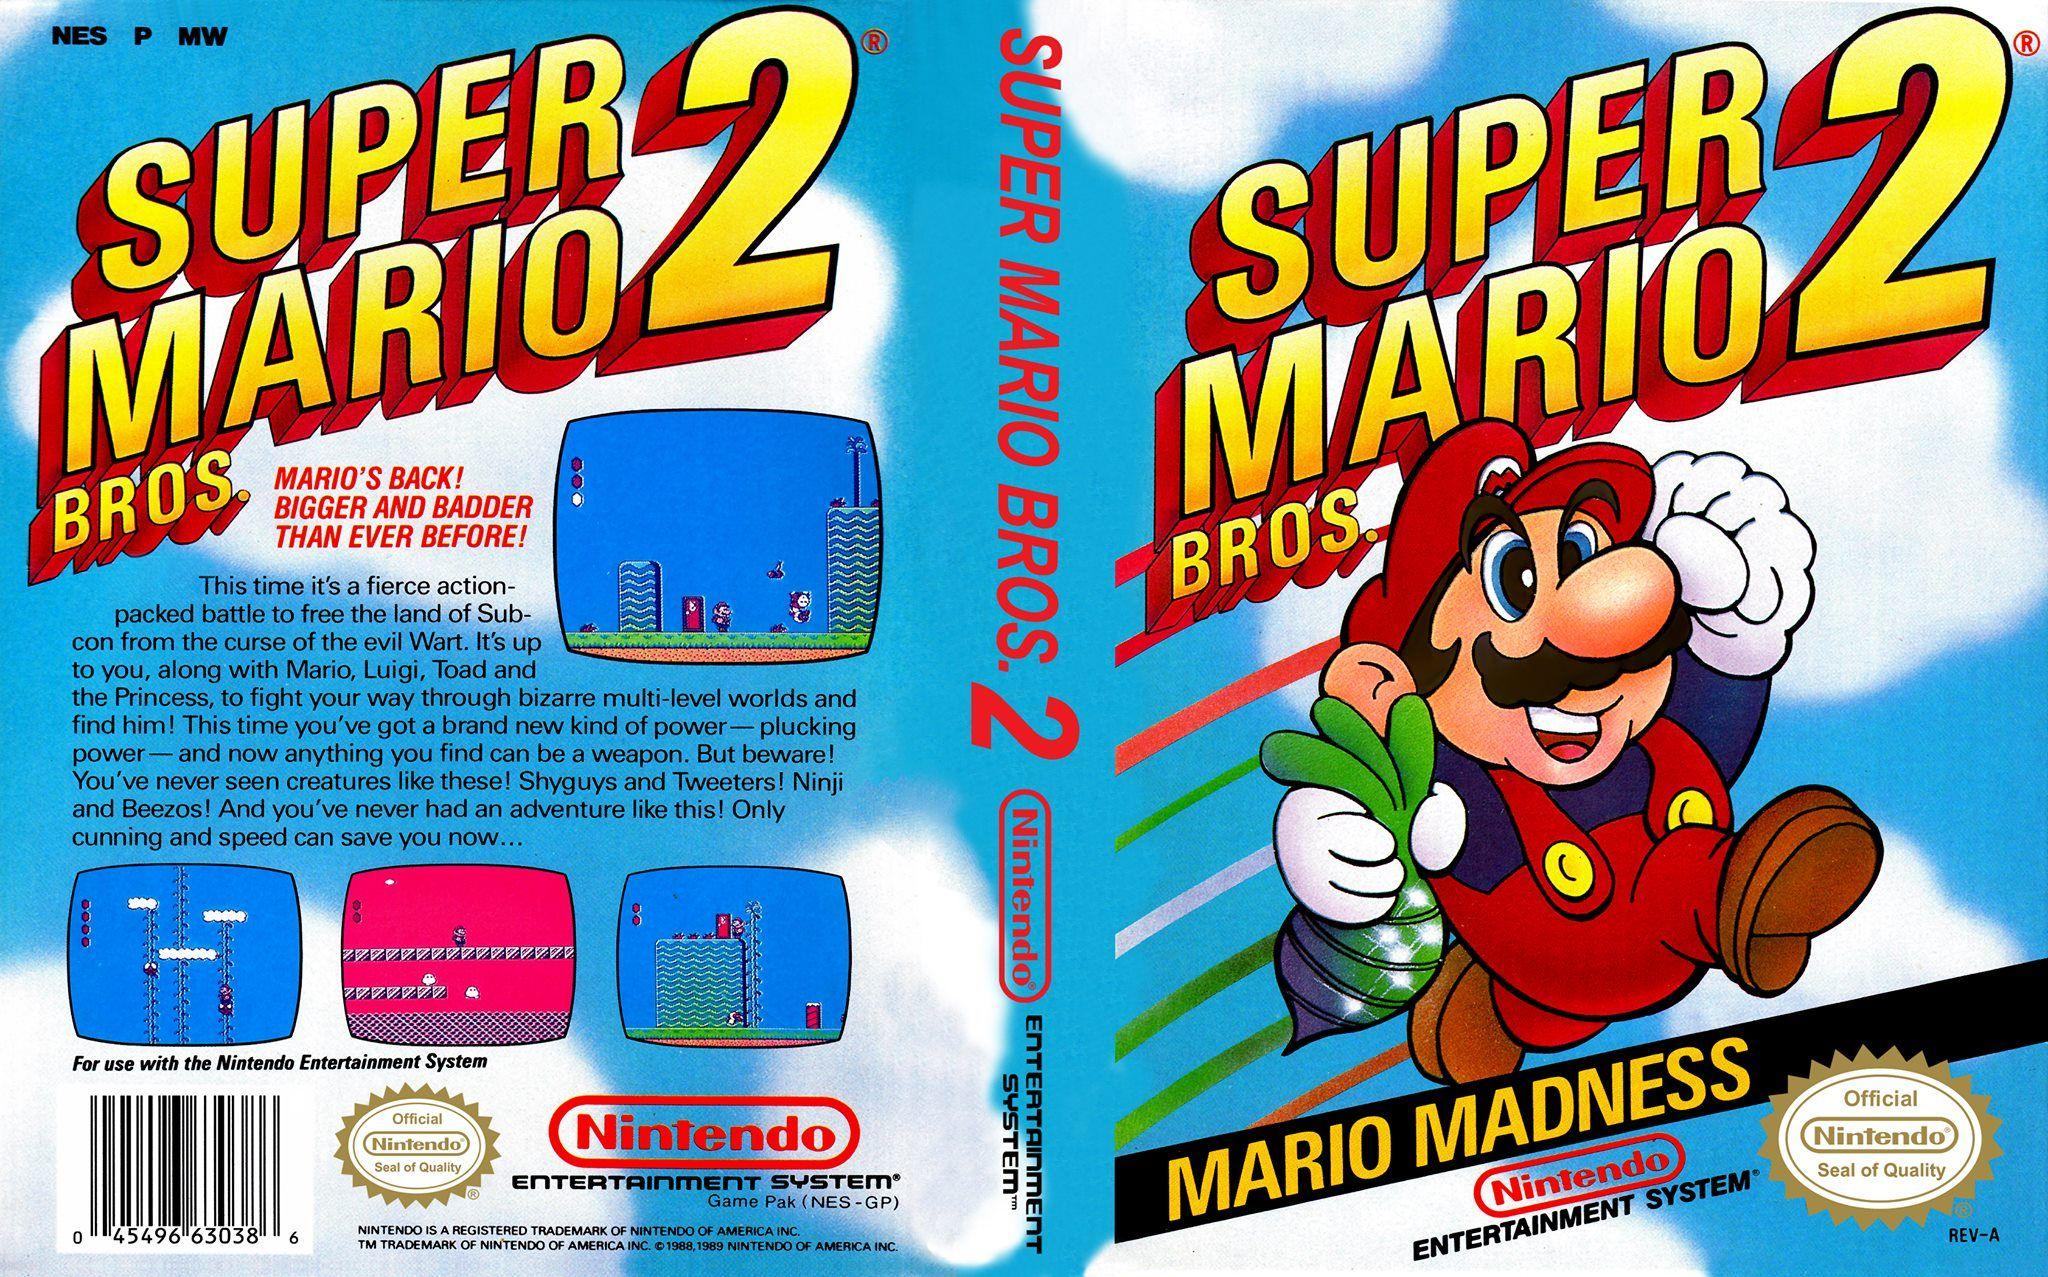 Super Mario Bros 2 Nes Mario Bros Super Mario Bros Nintendo Nes